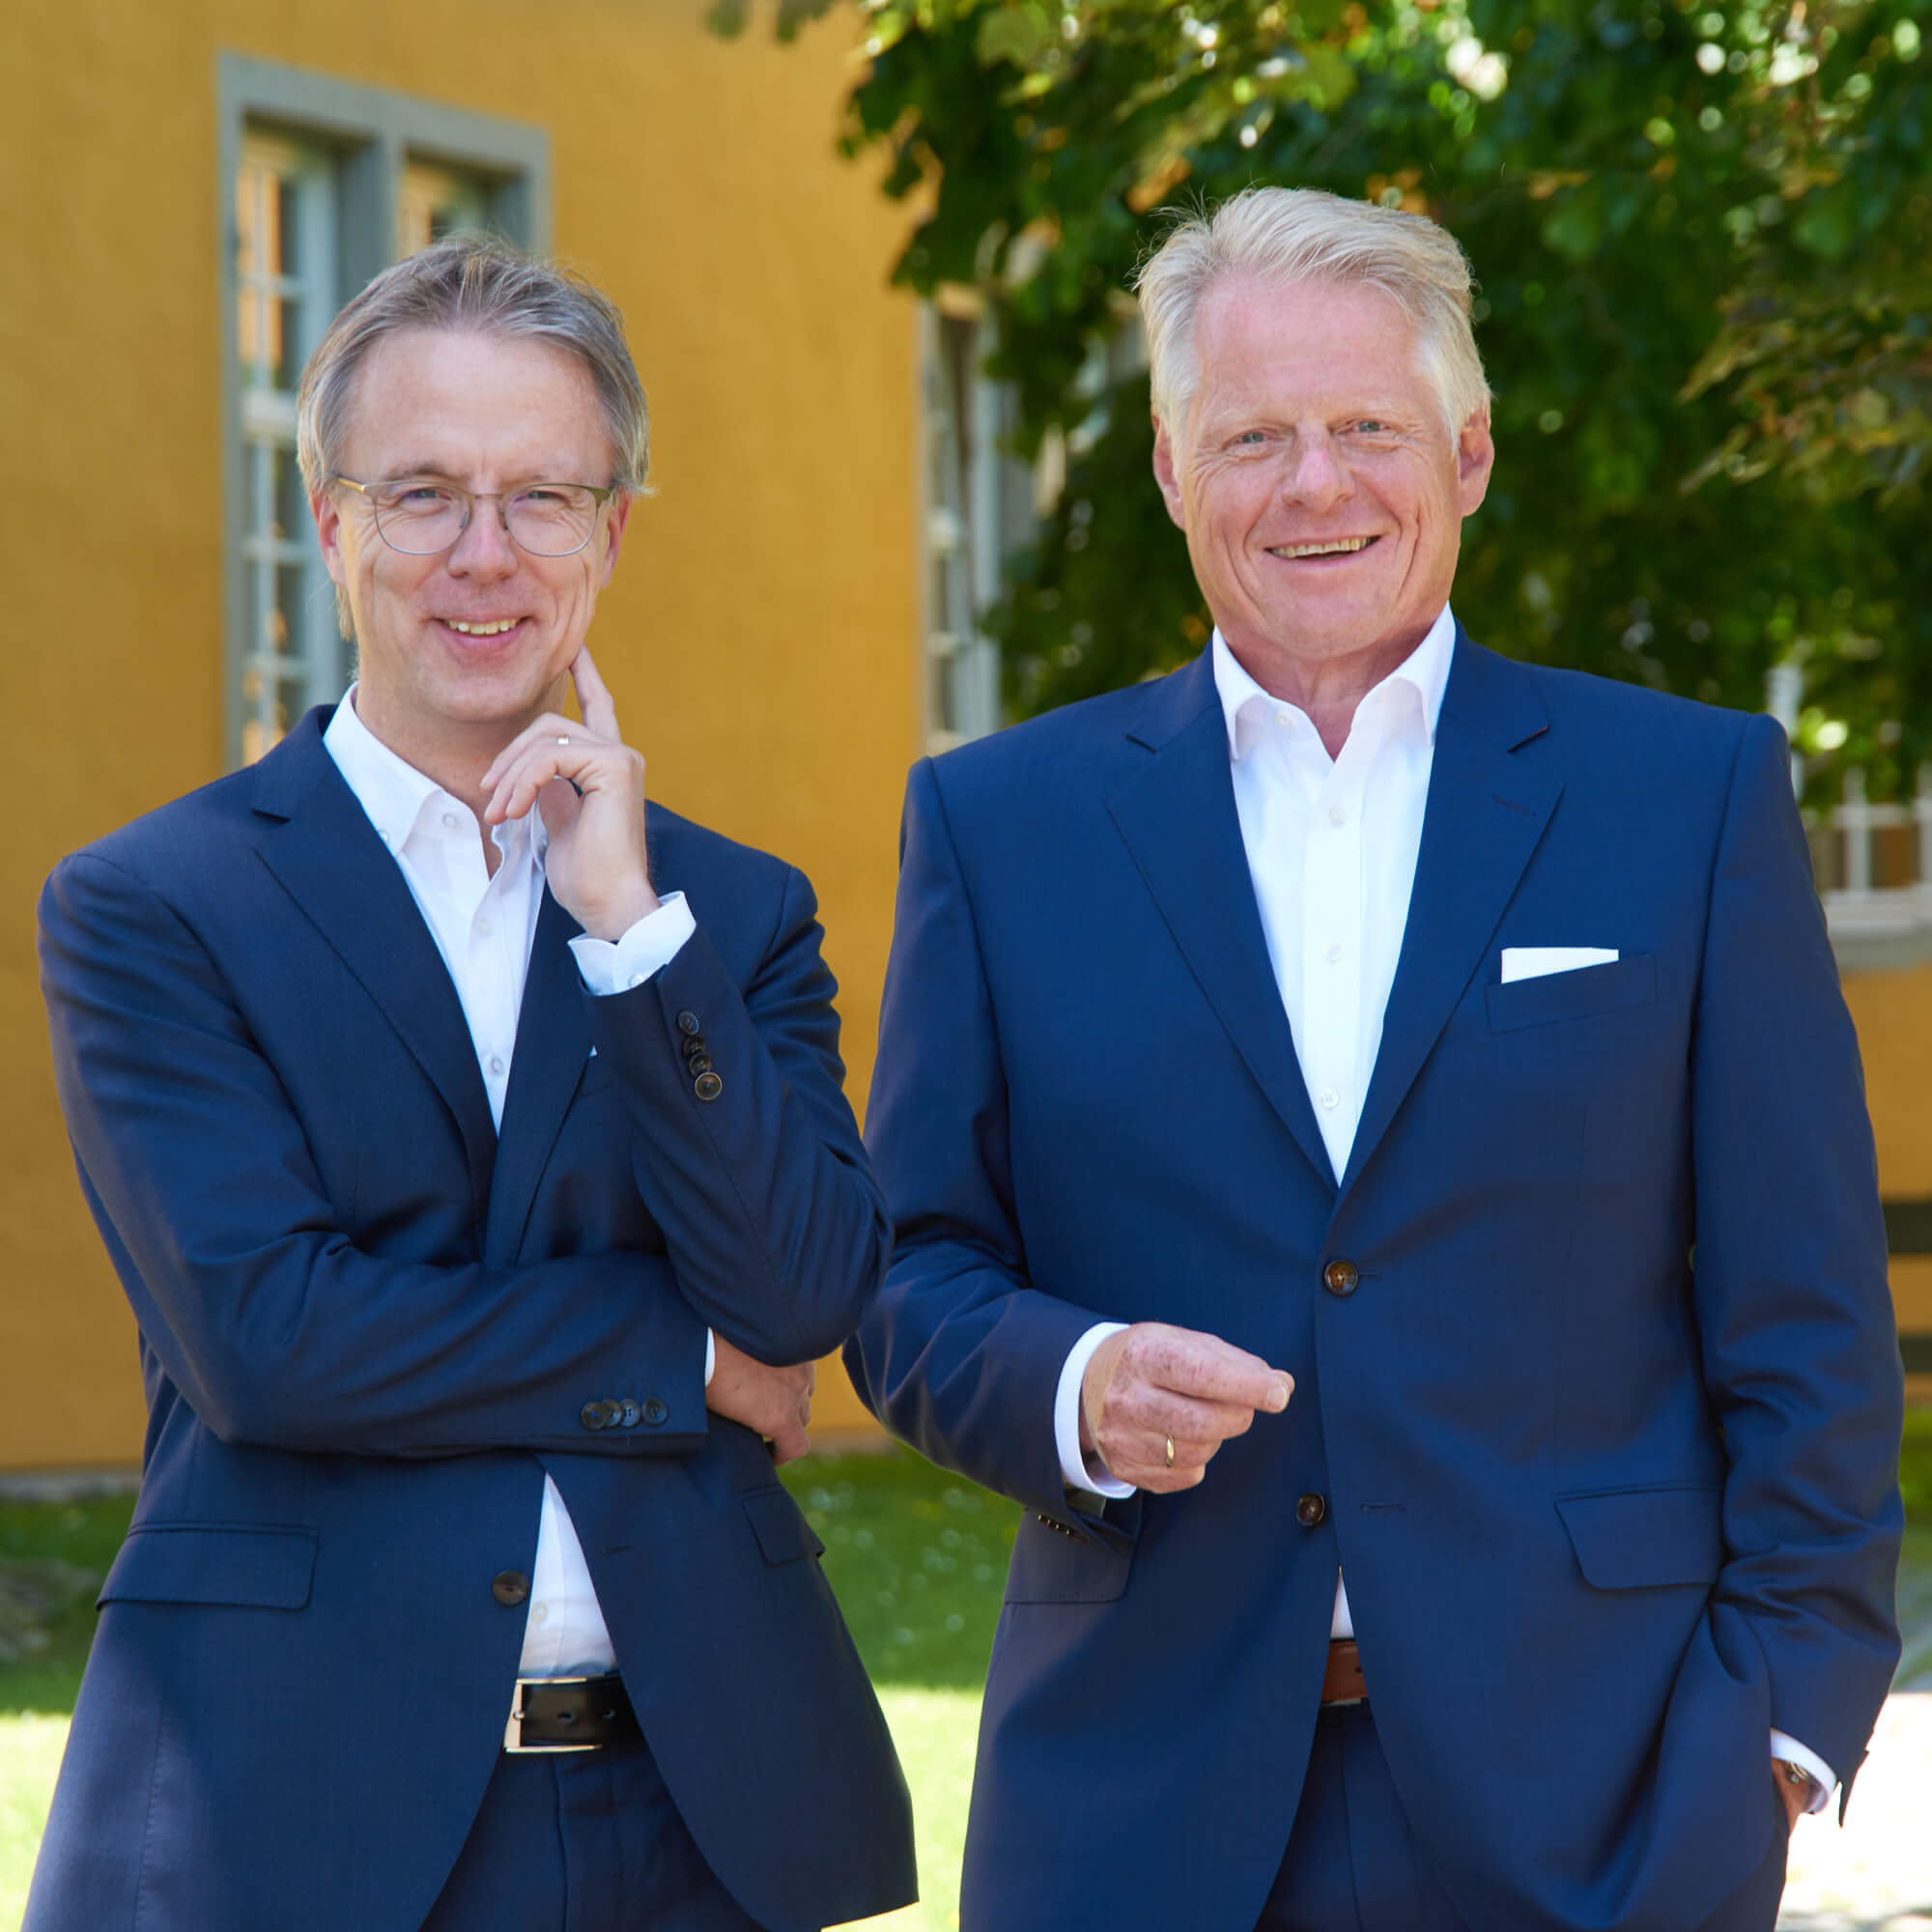 900 Millionen Euro Kapital – in besten Händen!